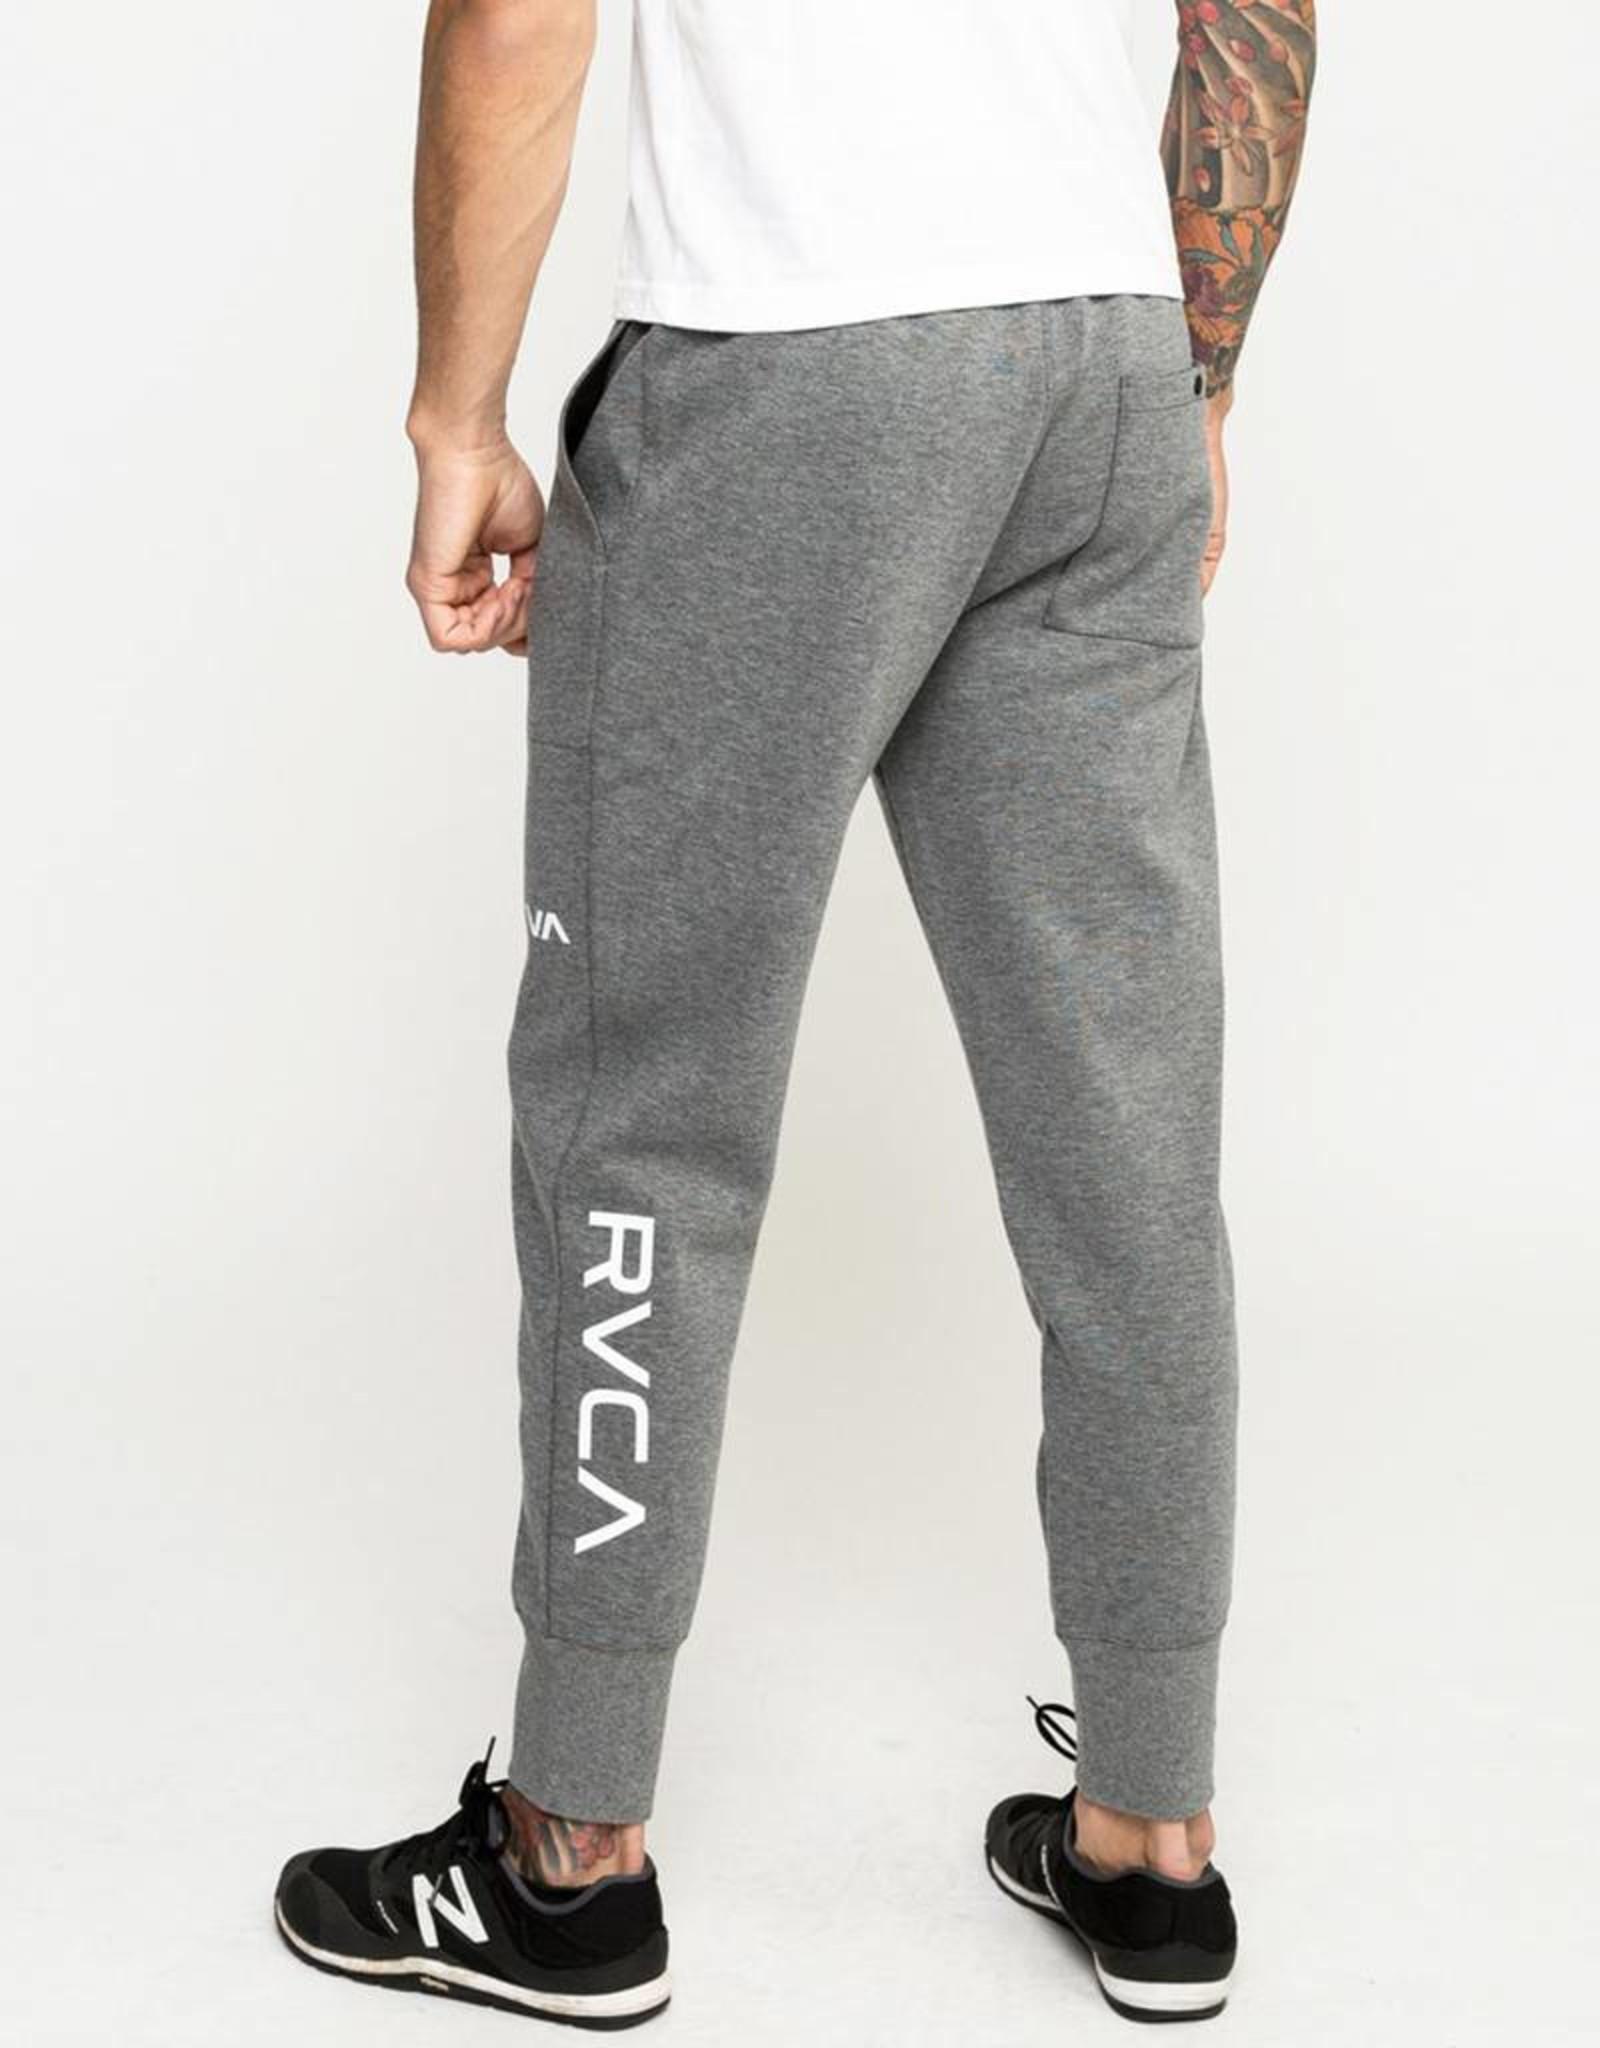 RVCA Sideline Sweatpant